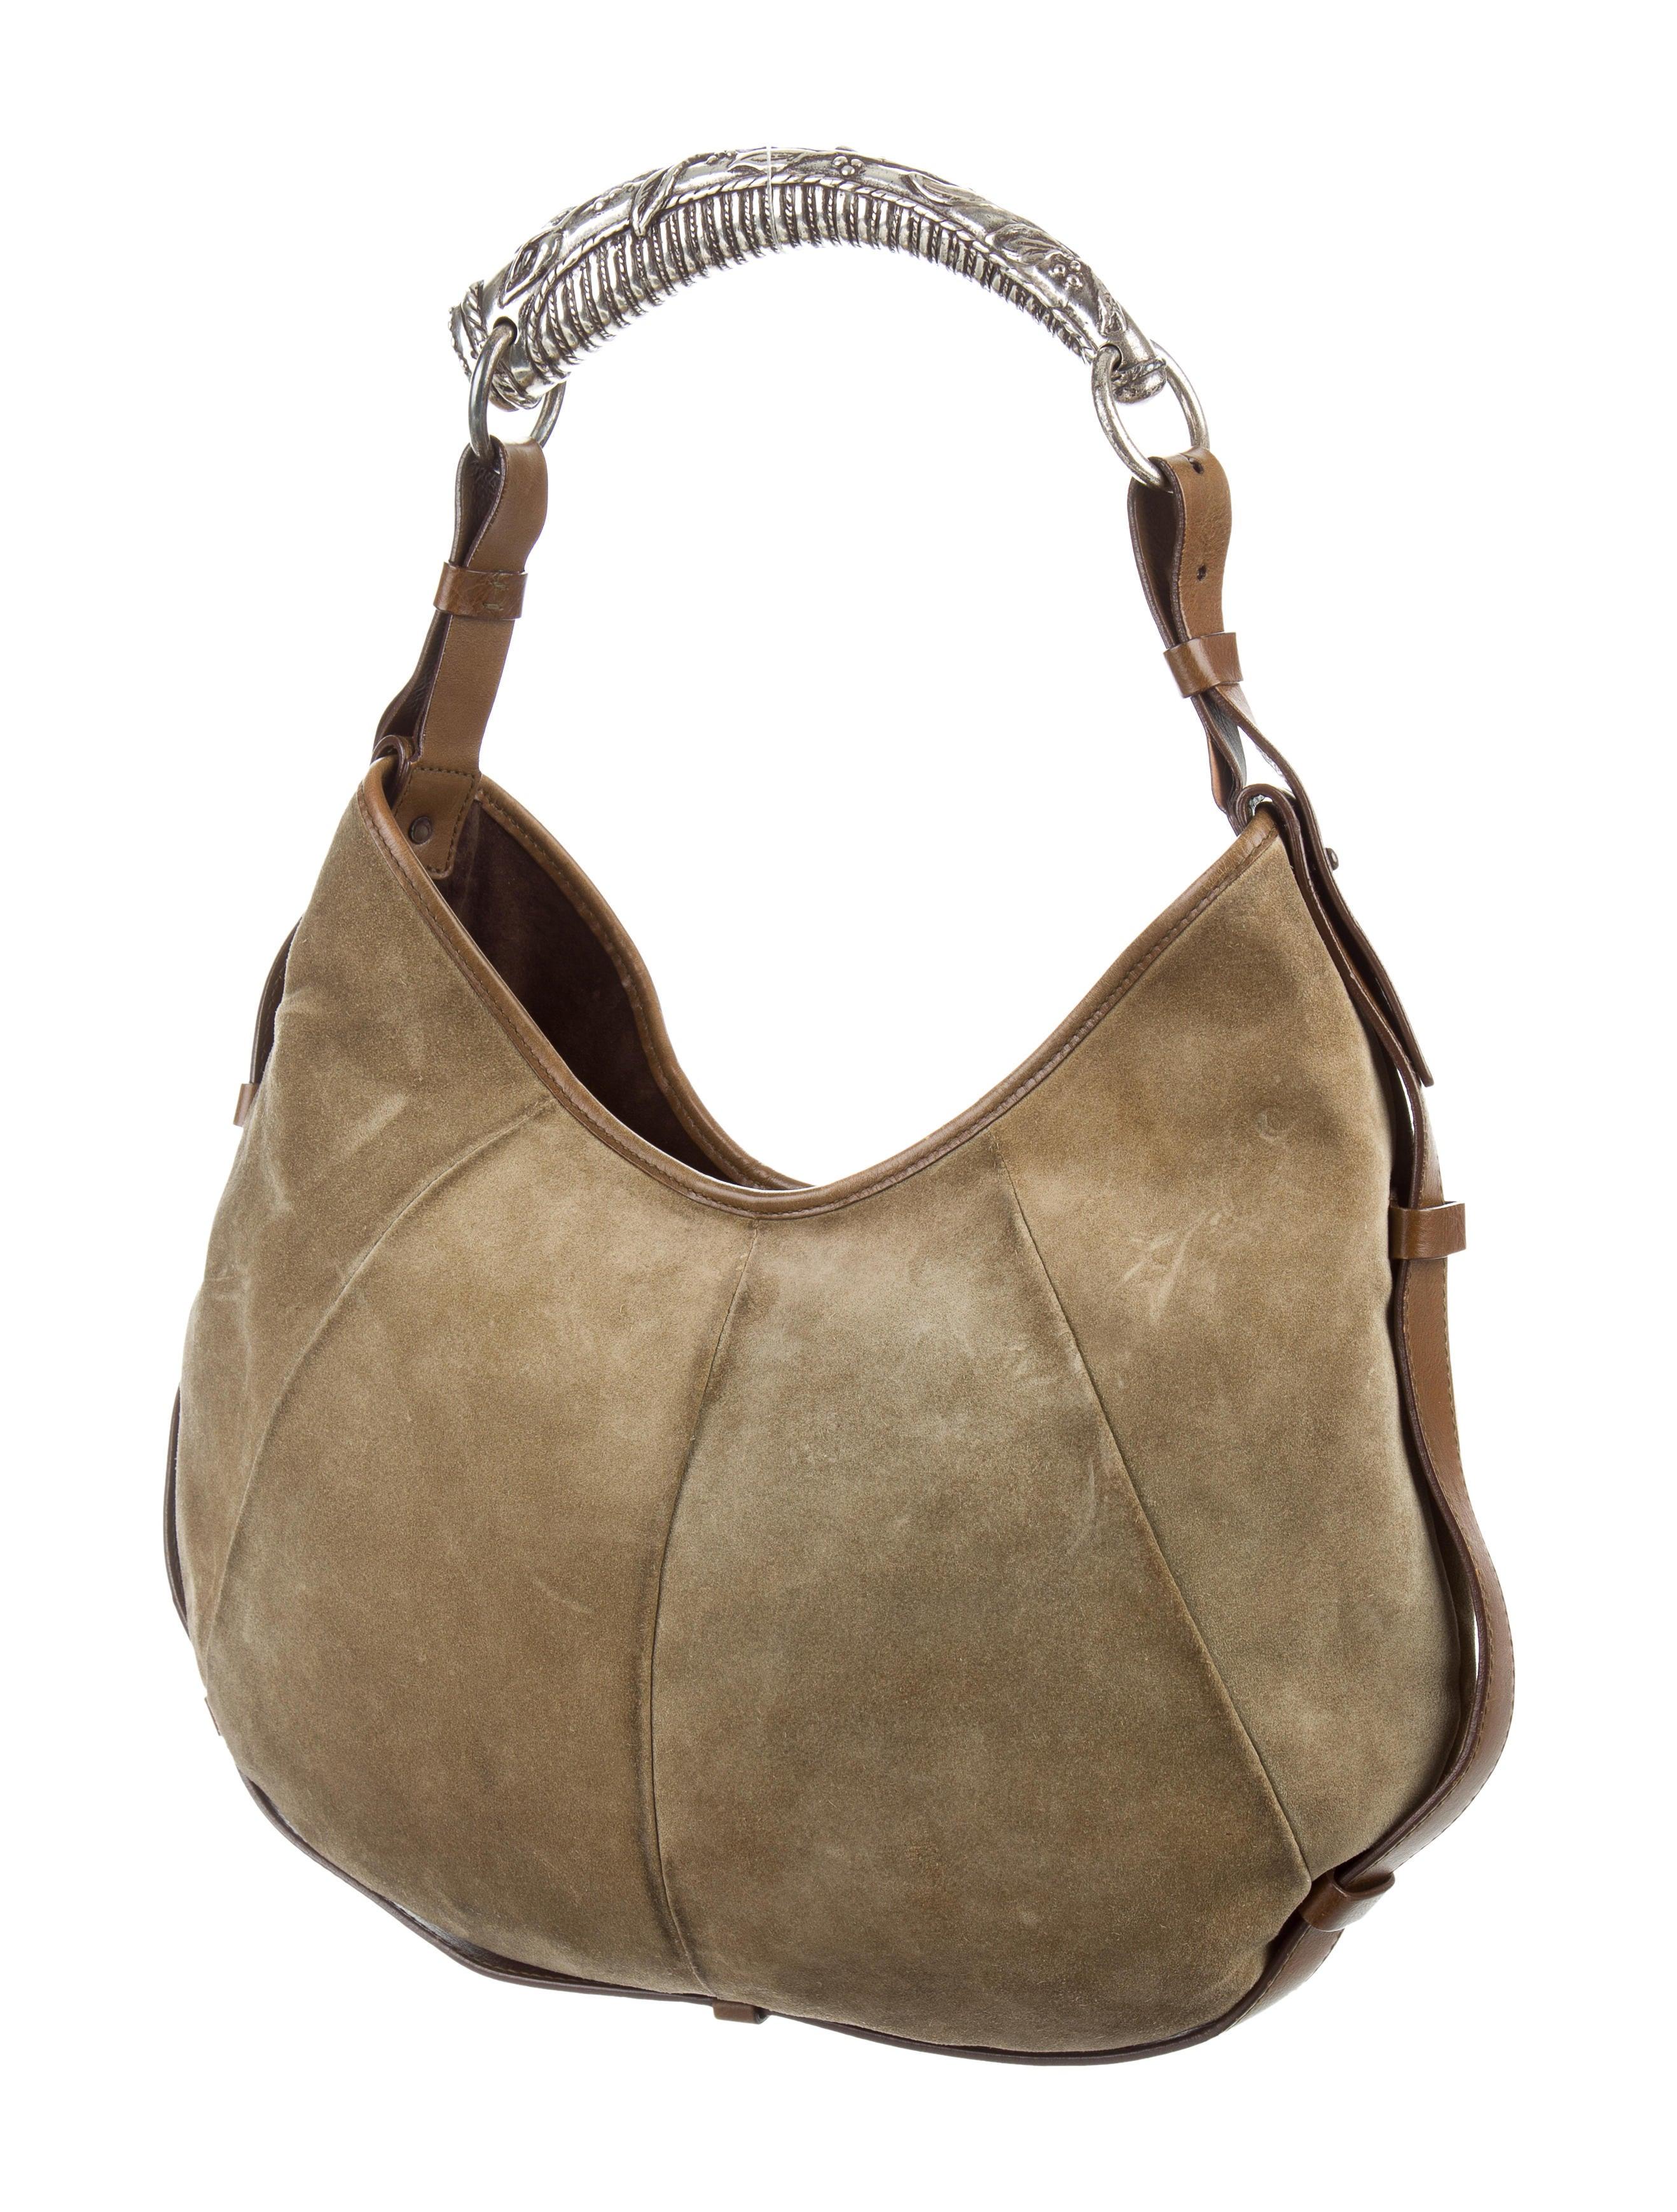 Yves Saint Laurent Mombasa Shoulder Bag - Handbags - YVE69923  286a5d393b640